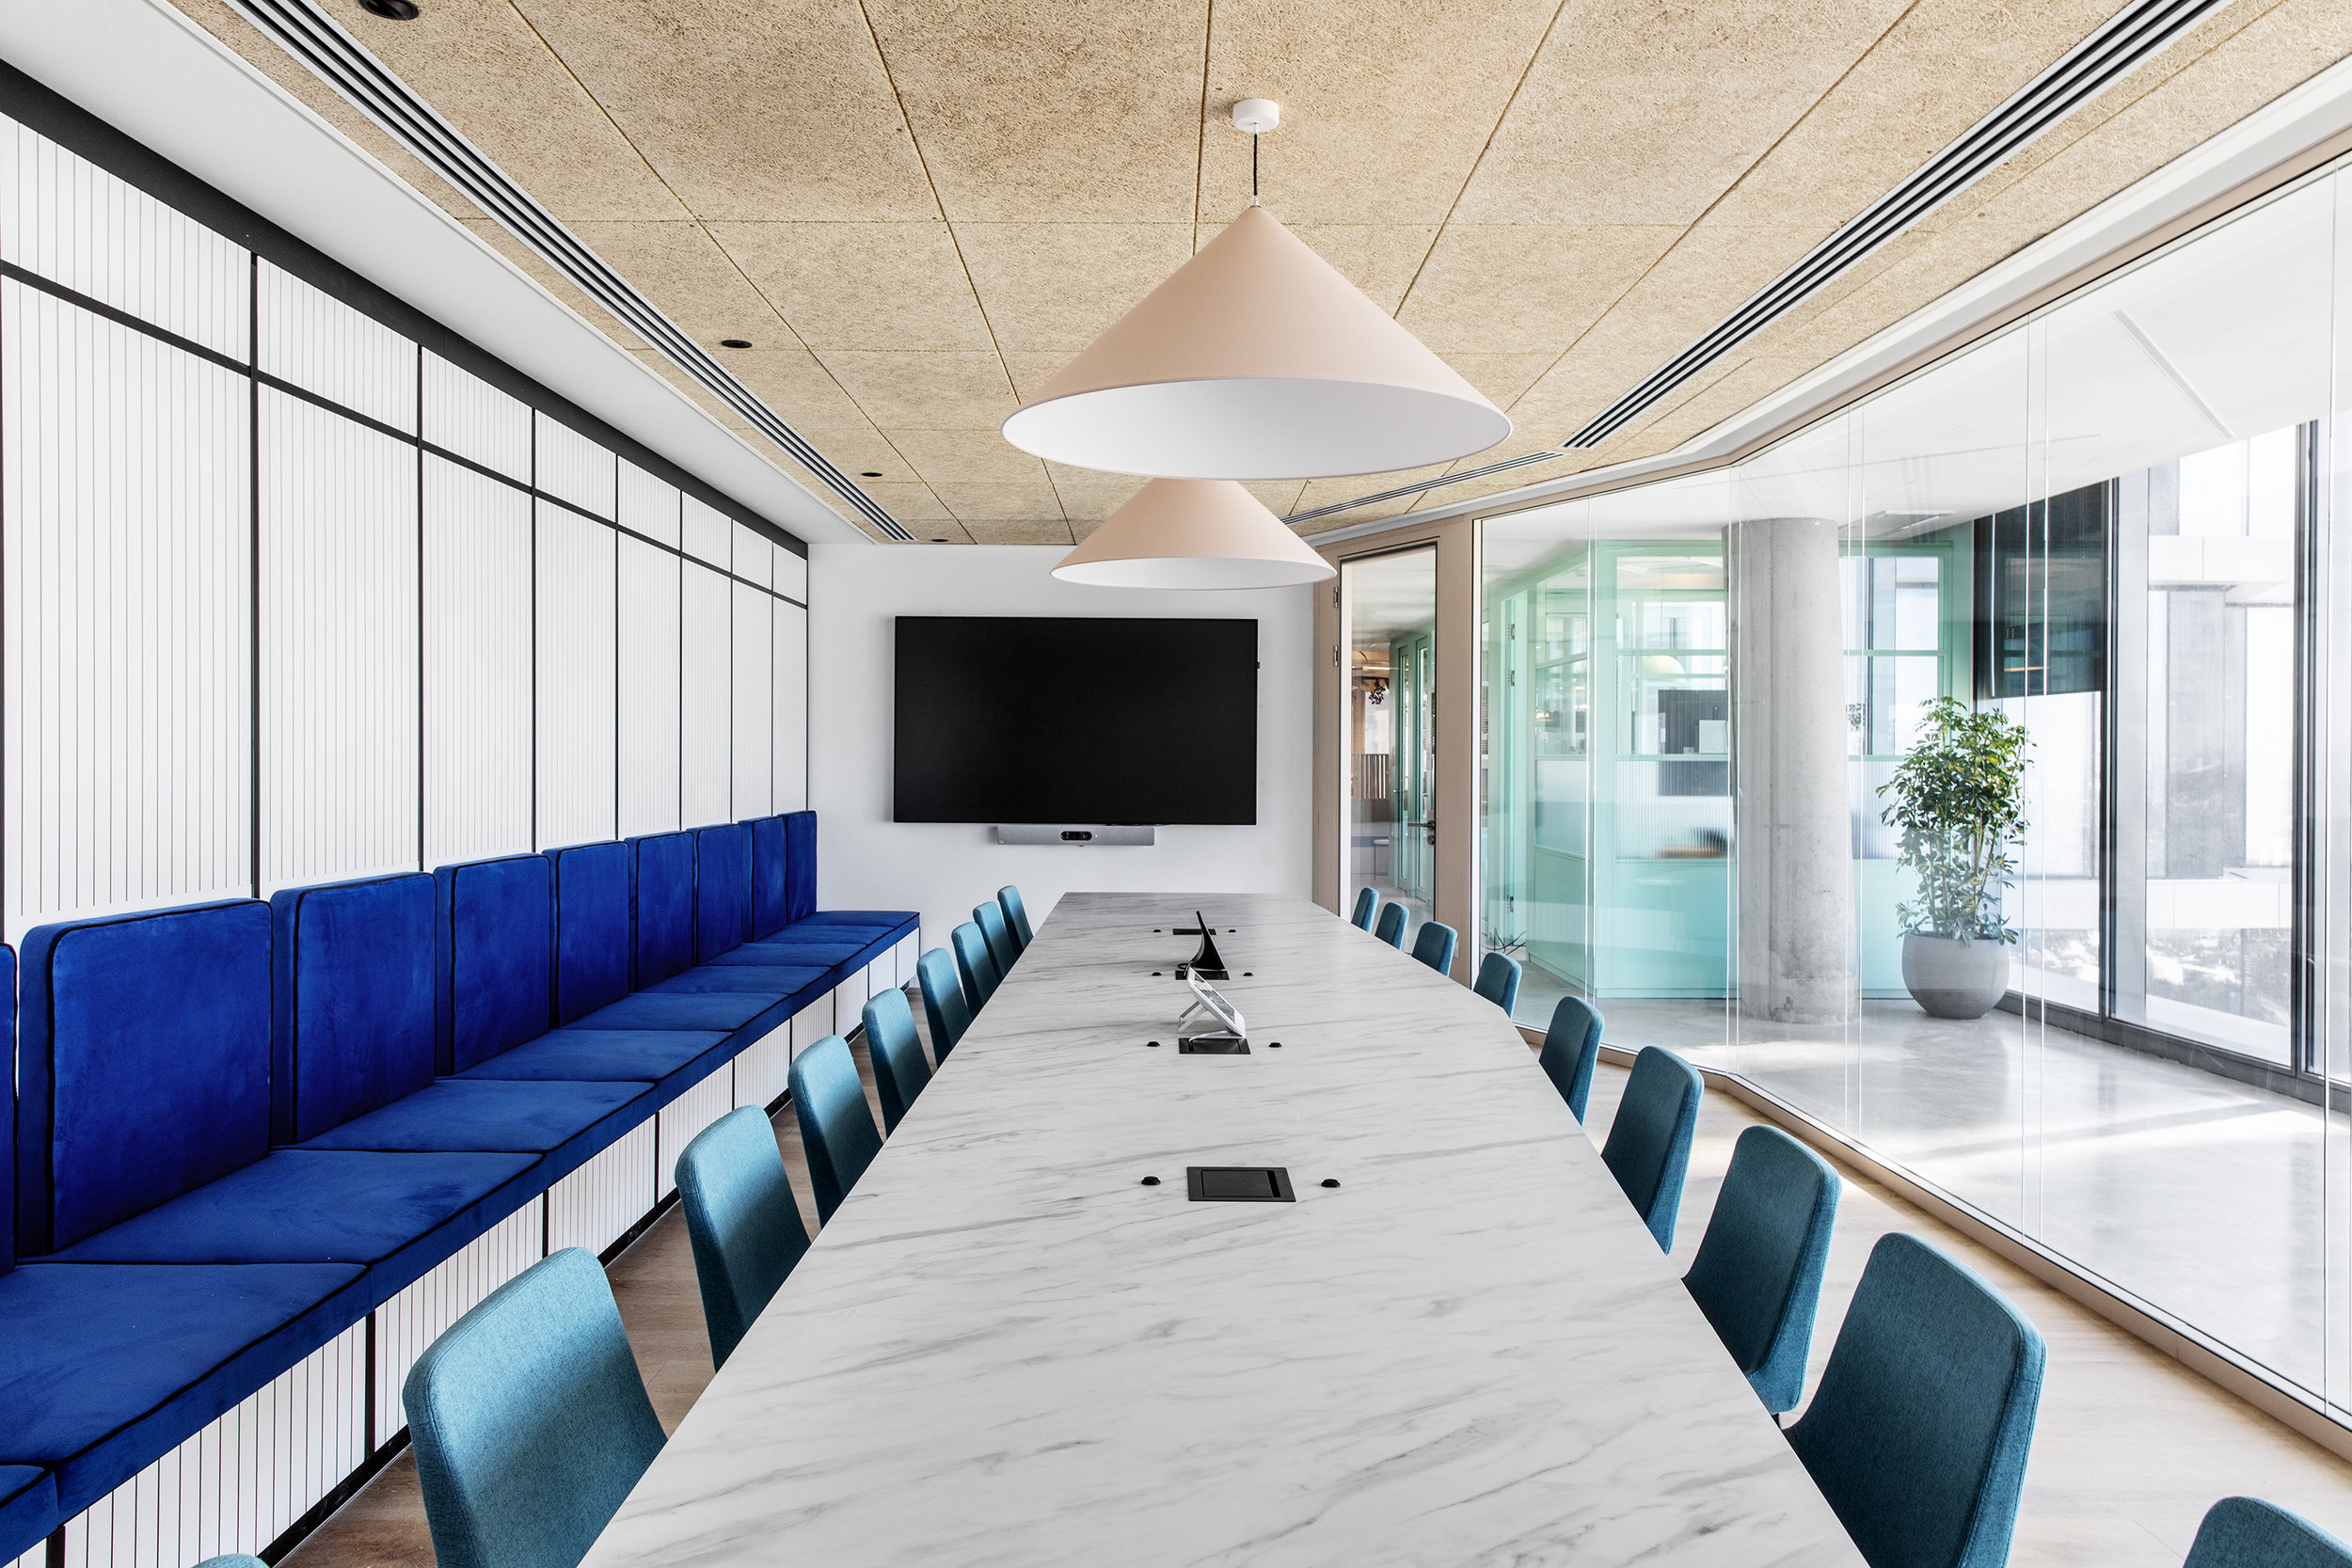 רואי דוד אדריכלות - אדריכל - נטורל אינטליג'נס - ROY DAVID - ARCHITECTURE - ARCHITECT - NI (105).jpg